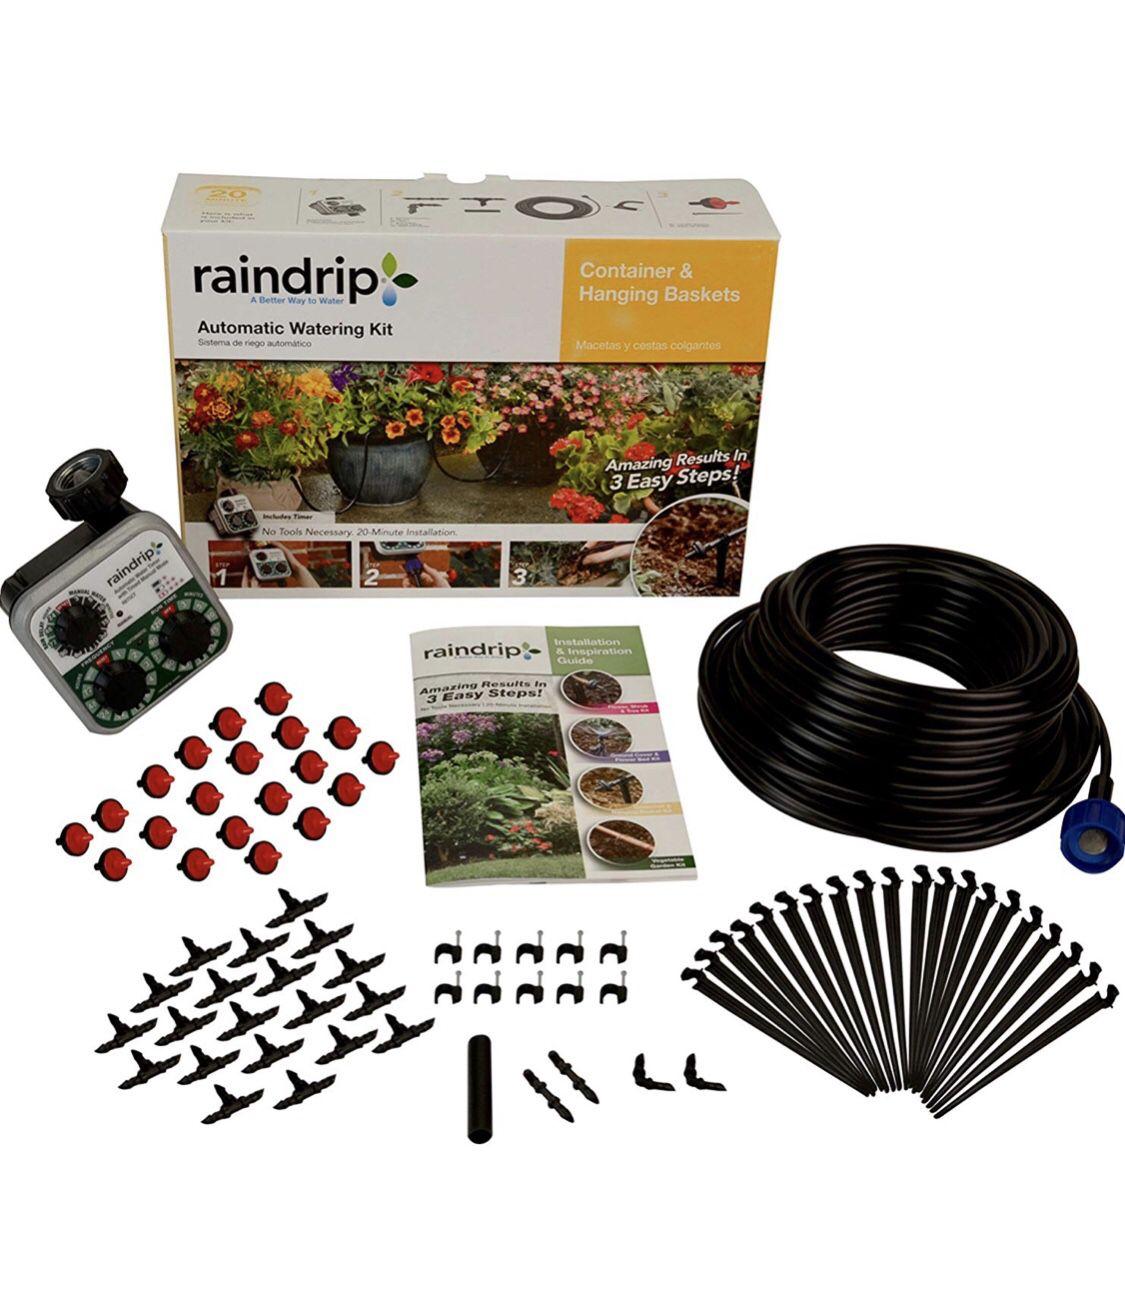 Raindrip irrigation